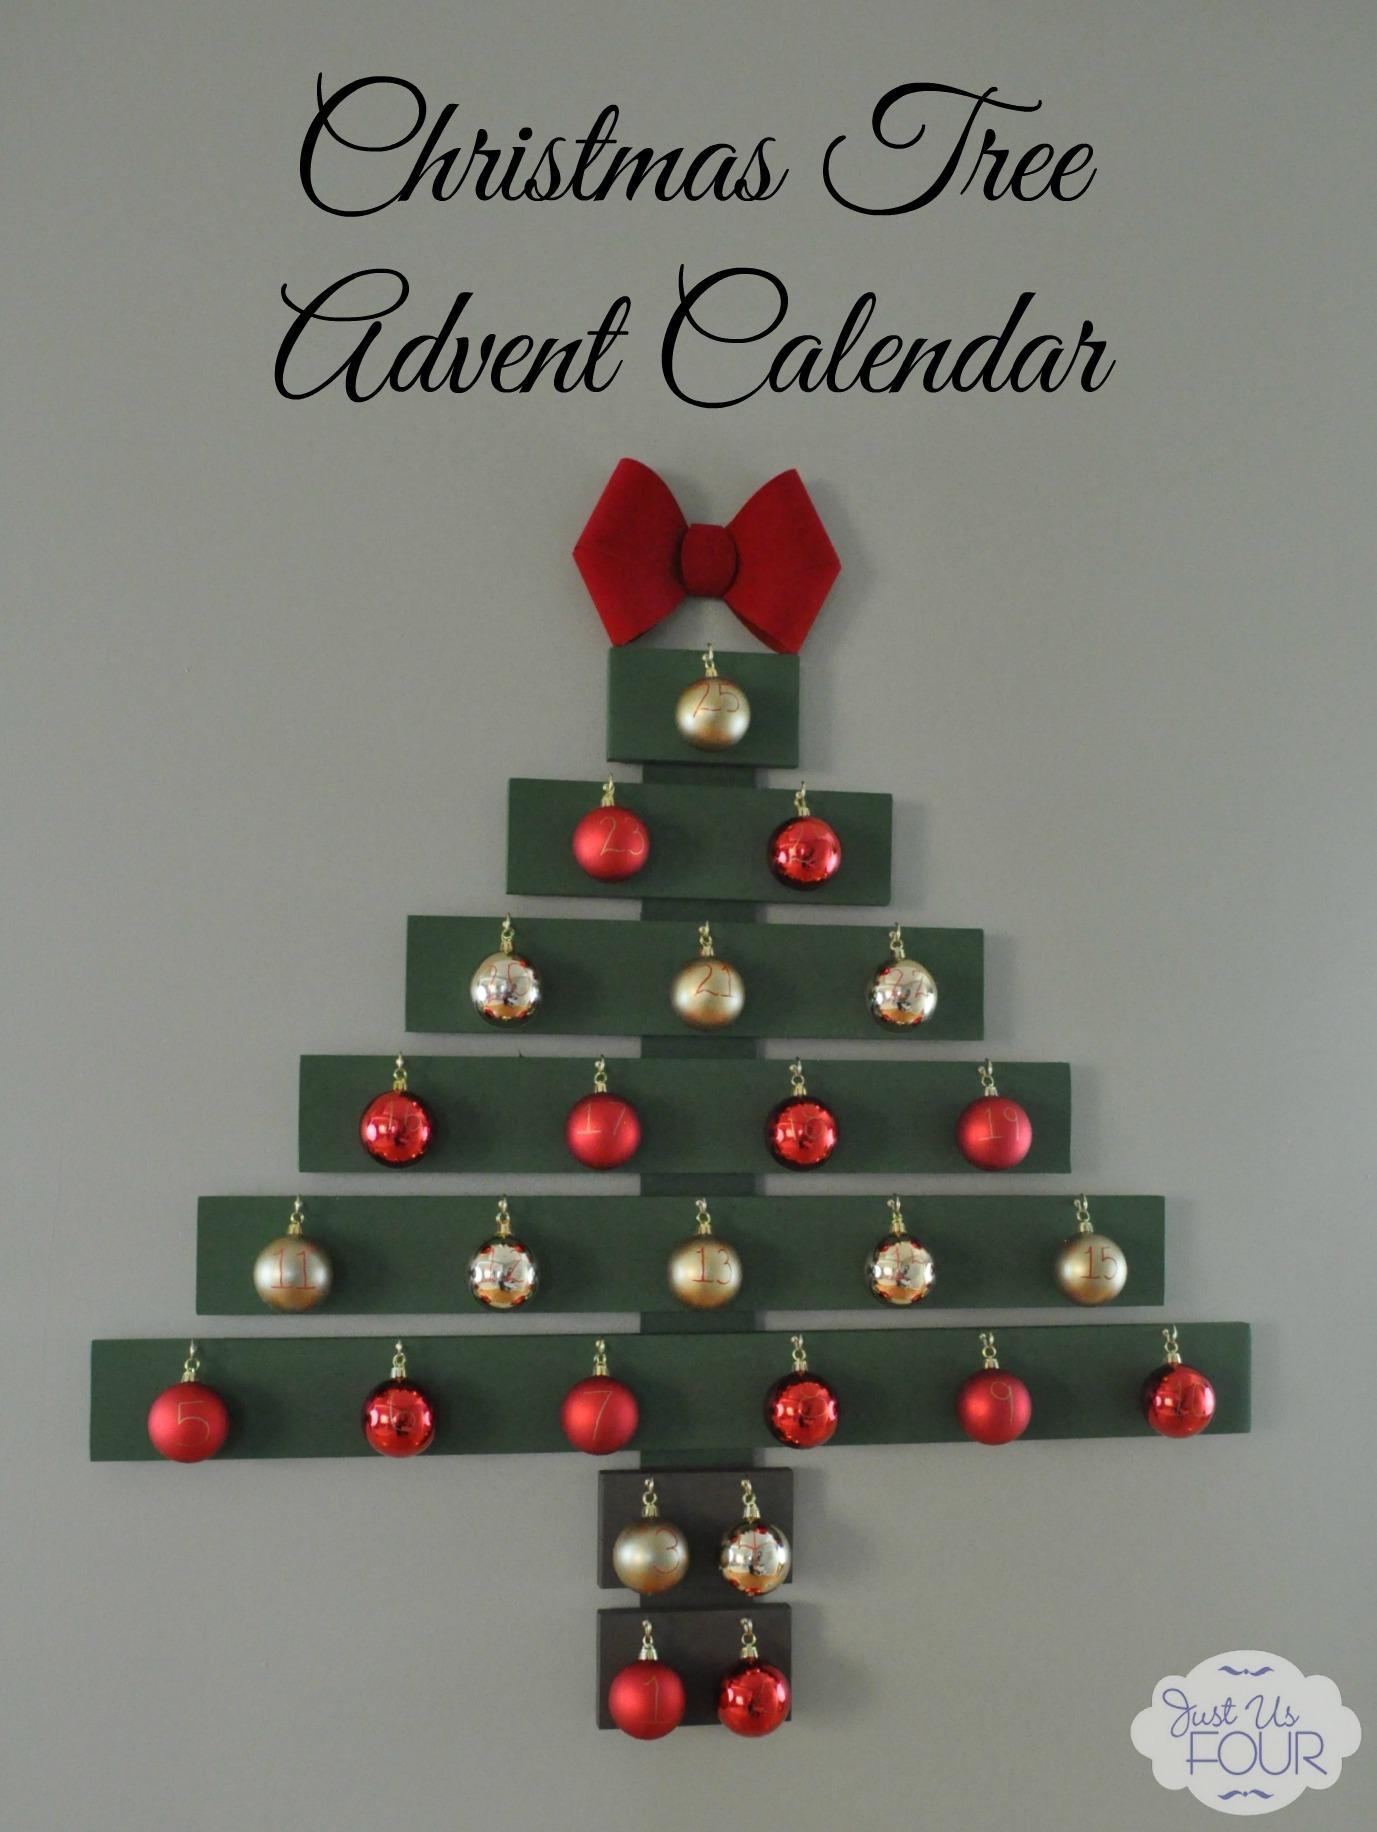 Christmas Tree Advent Calendar - My Suburban Kitchen